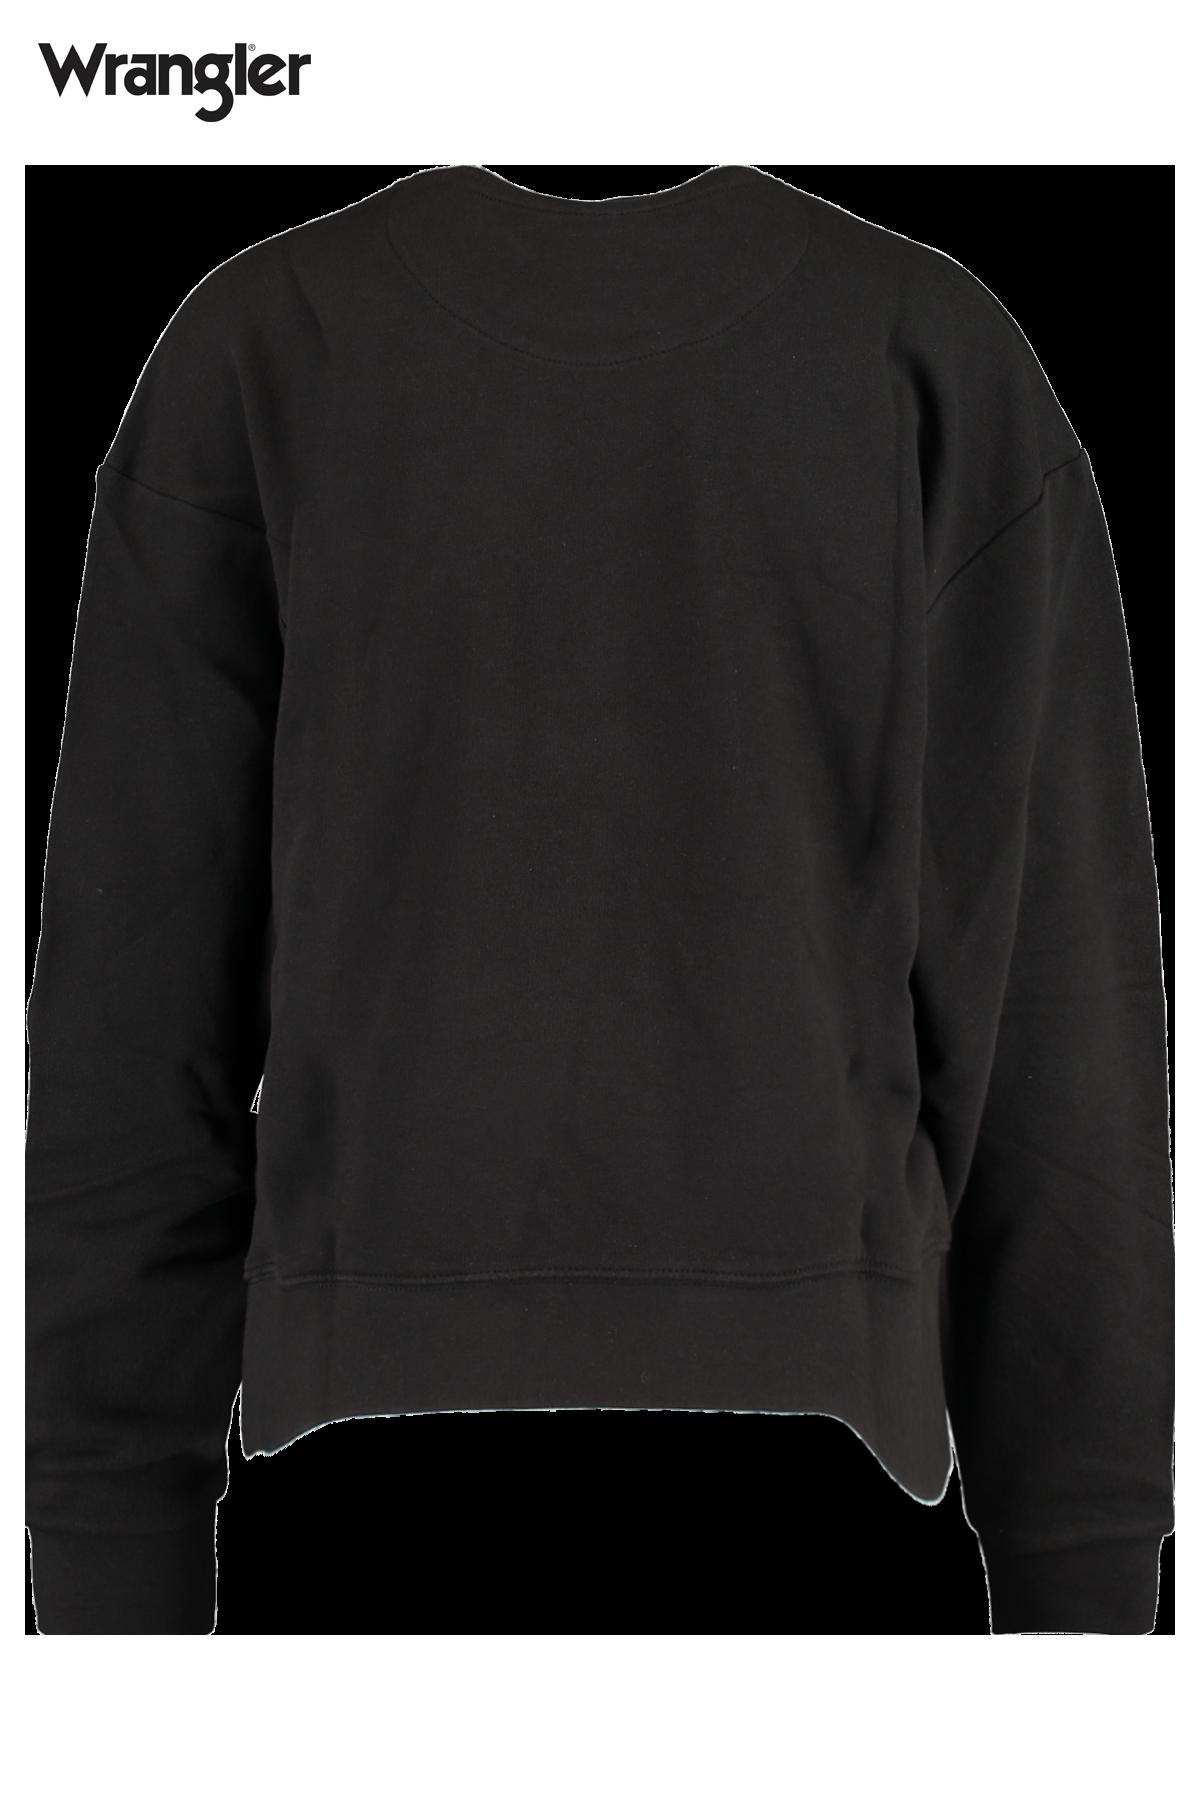 Sweater Retro sweat - worn black